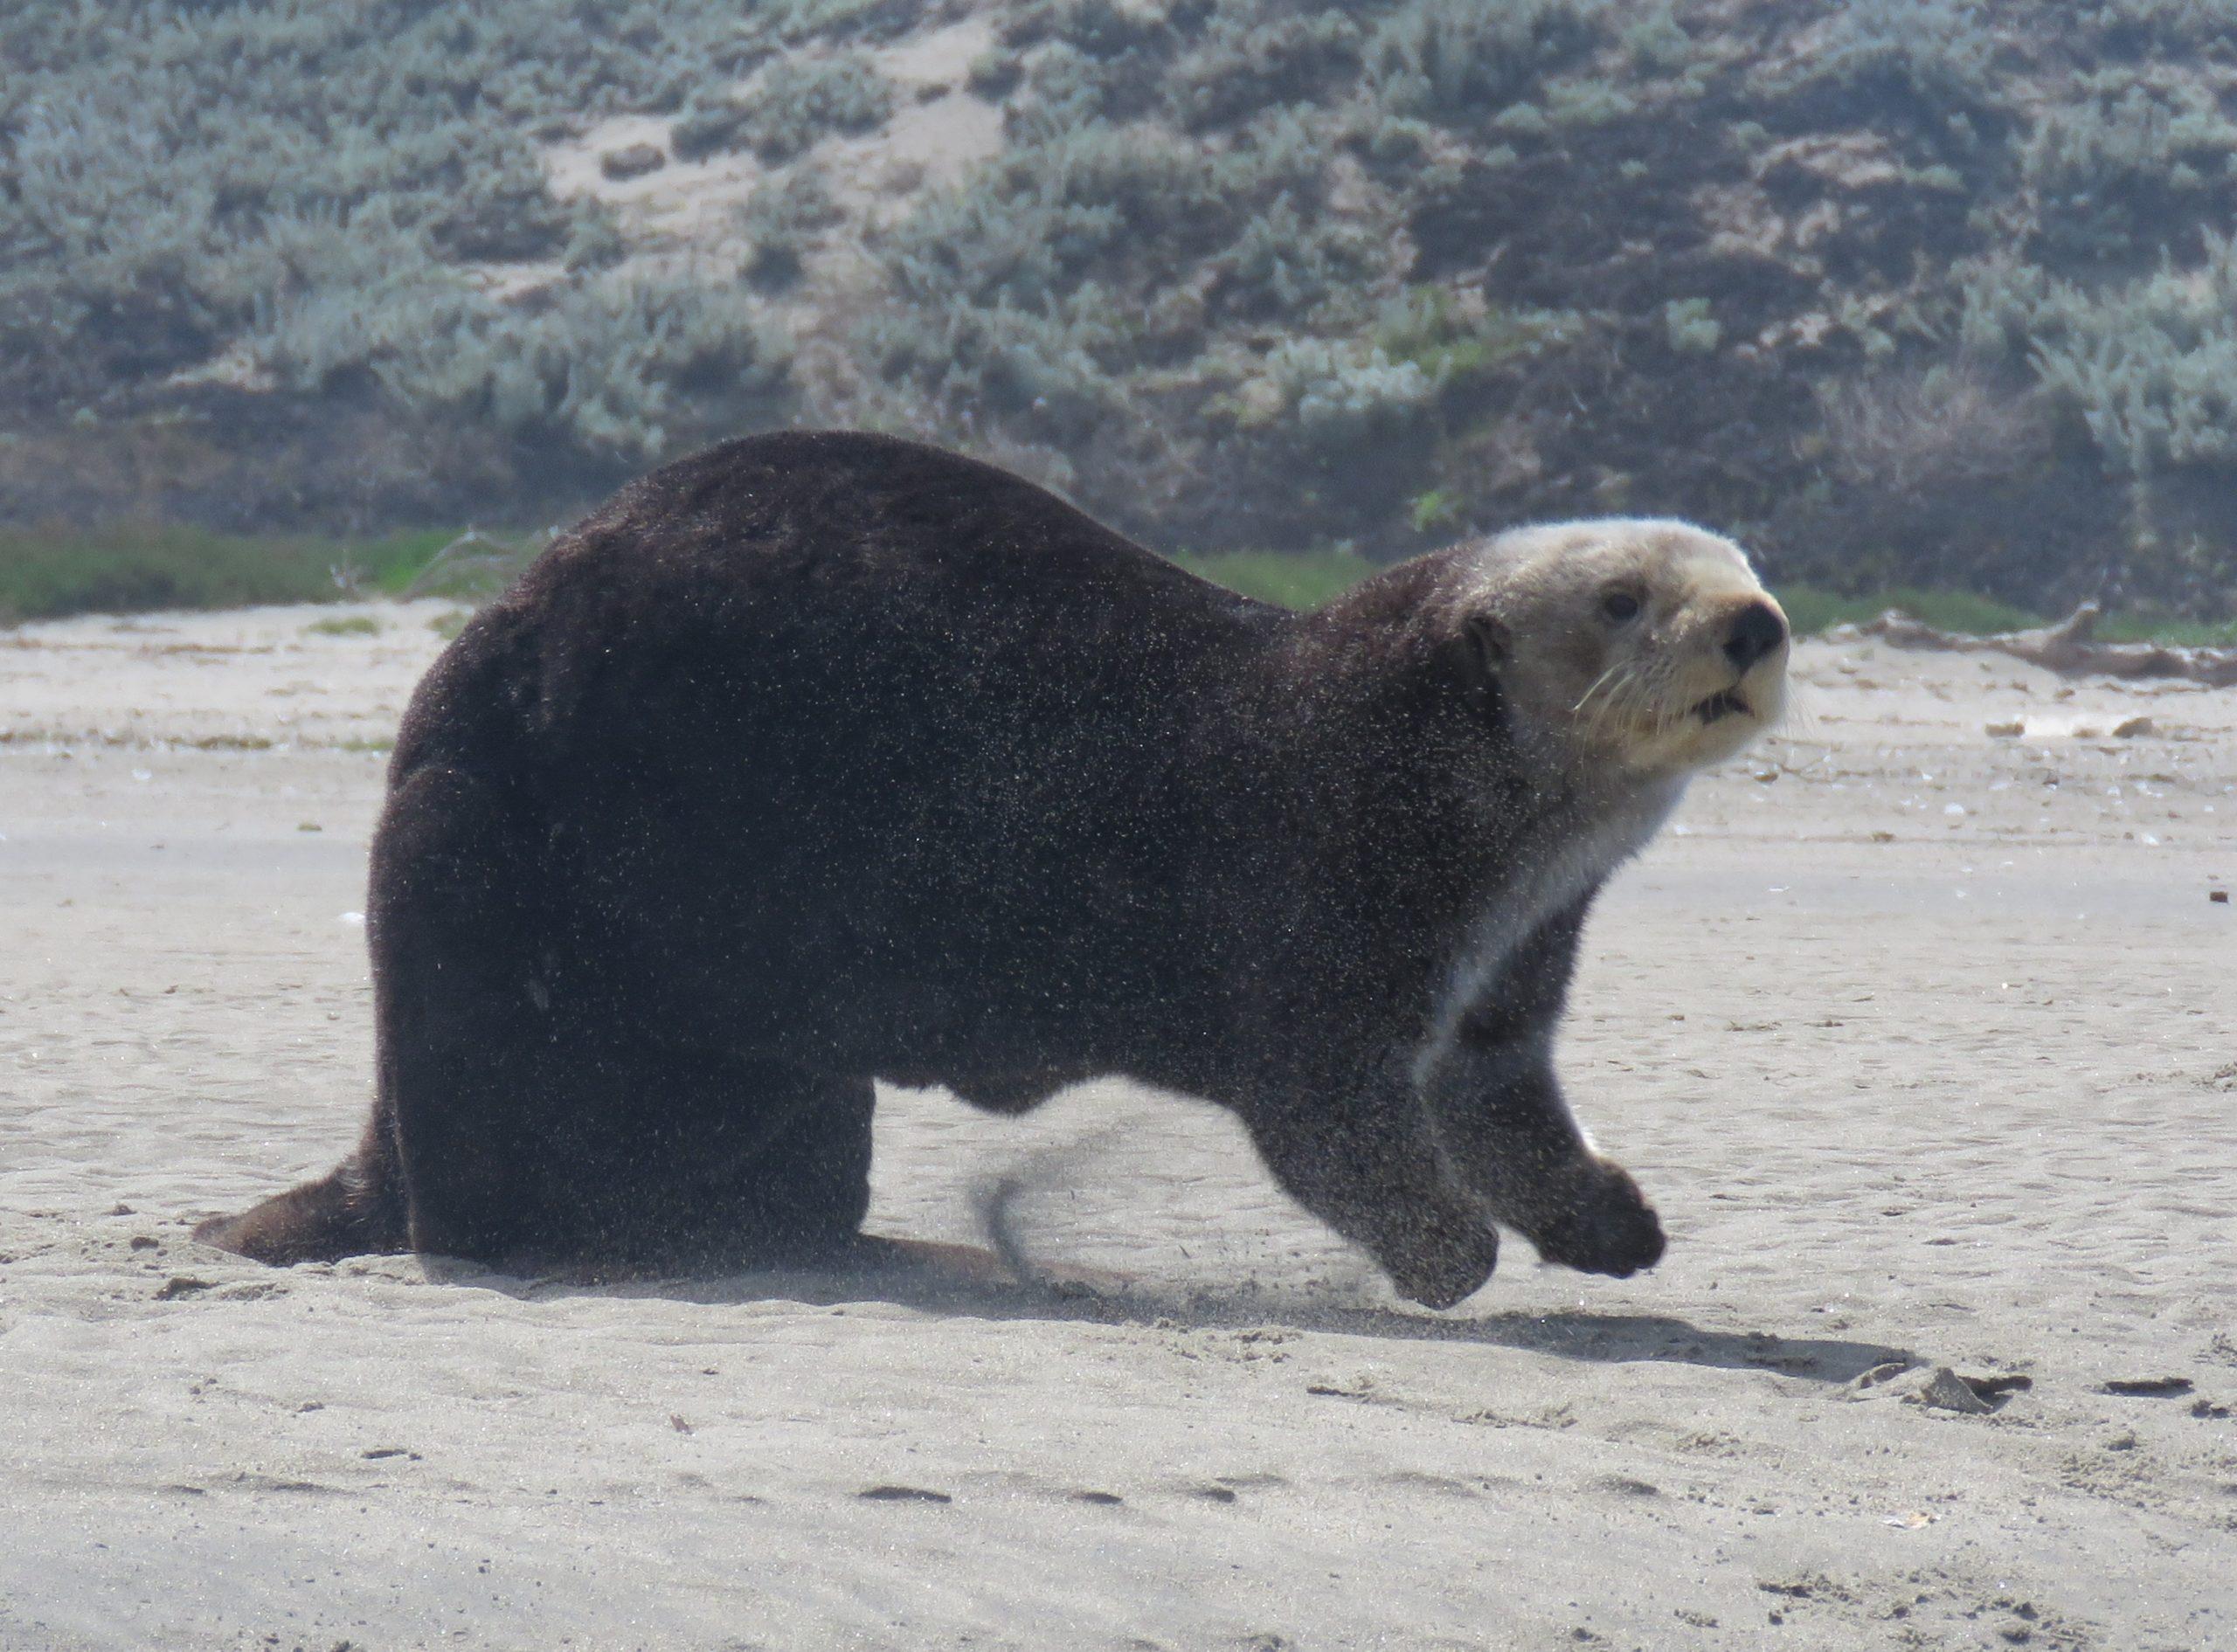 Seals & Sea Otter Pupping Season by Kayak: Elkhorn Slough